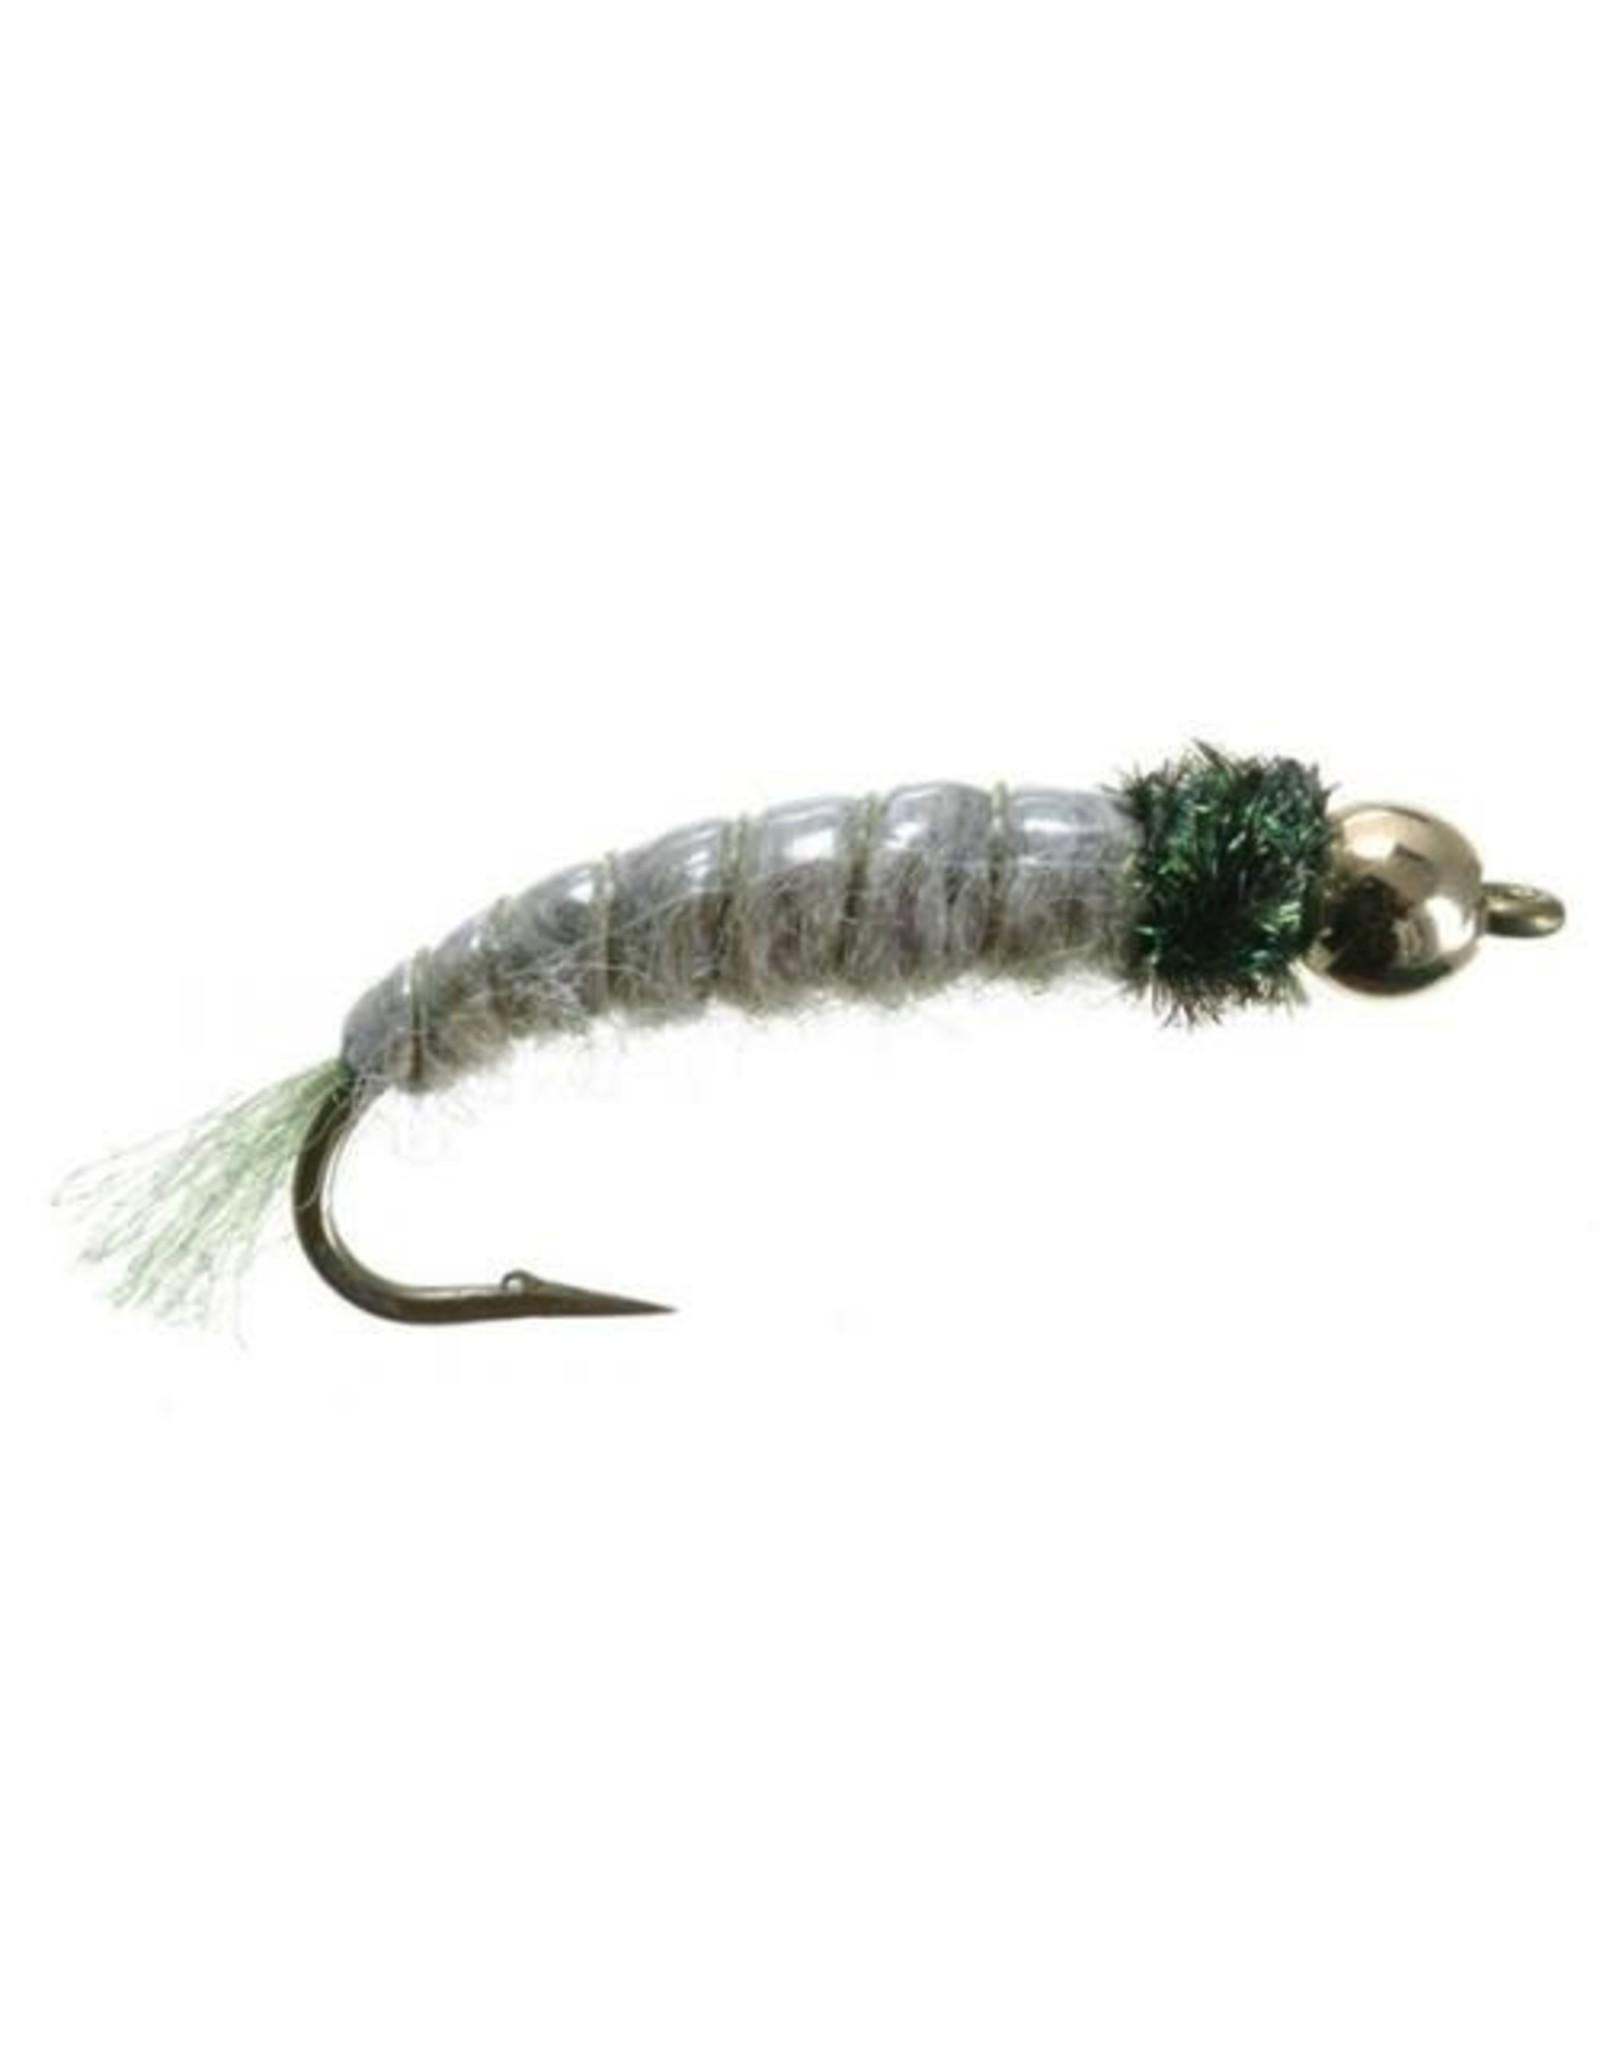 Umpqua Cranefly Larva (3 Pack)